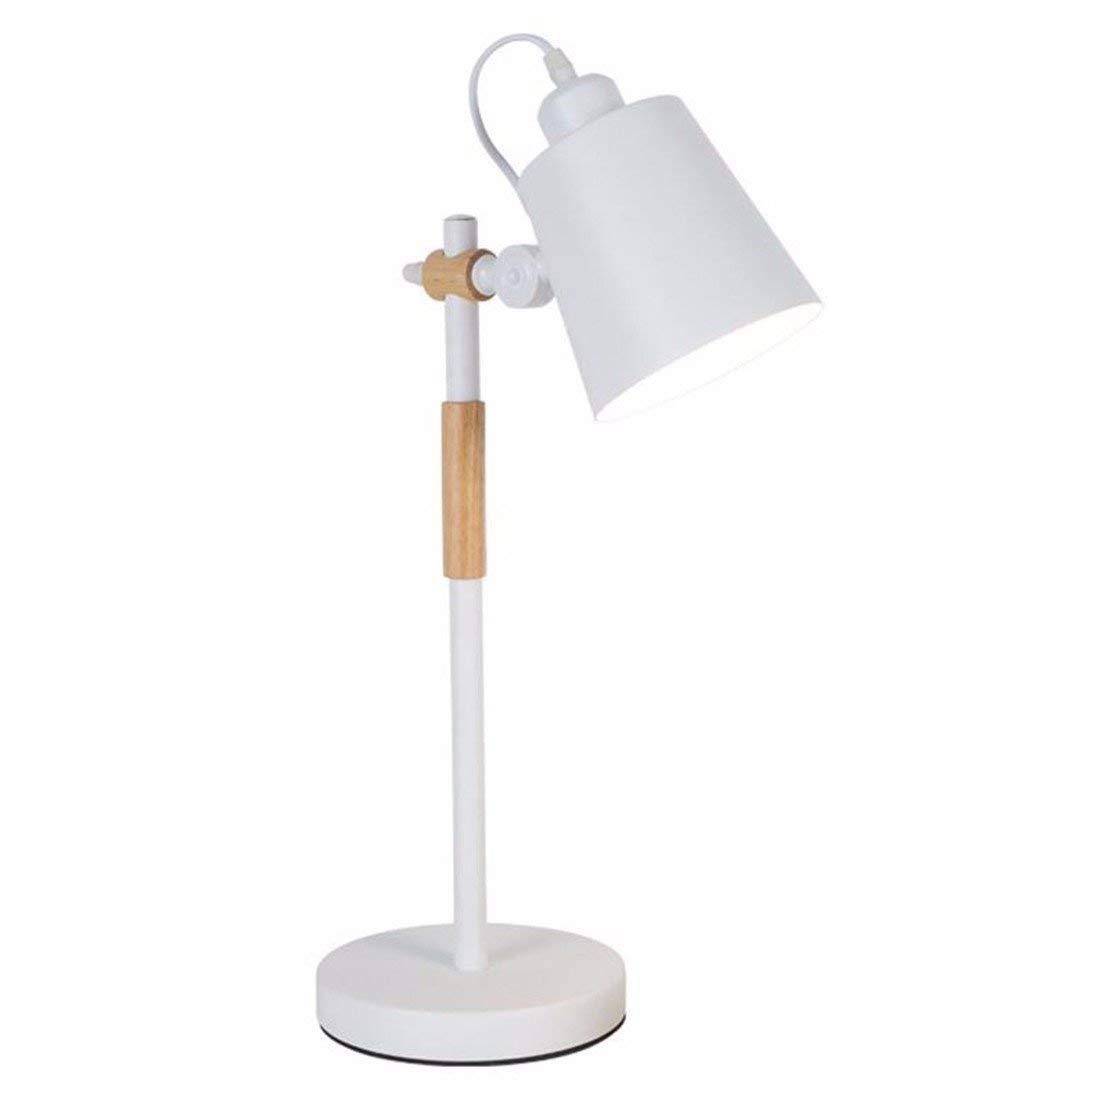 QPGGP-Table Lamp Nordic Eye Lamp Desk College Student Minimalist Modern Girls Dormitory Creative Bedroom Headlamp